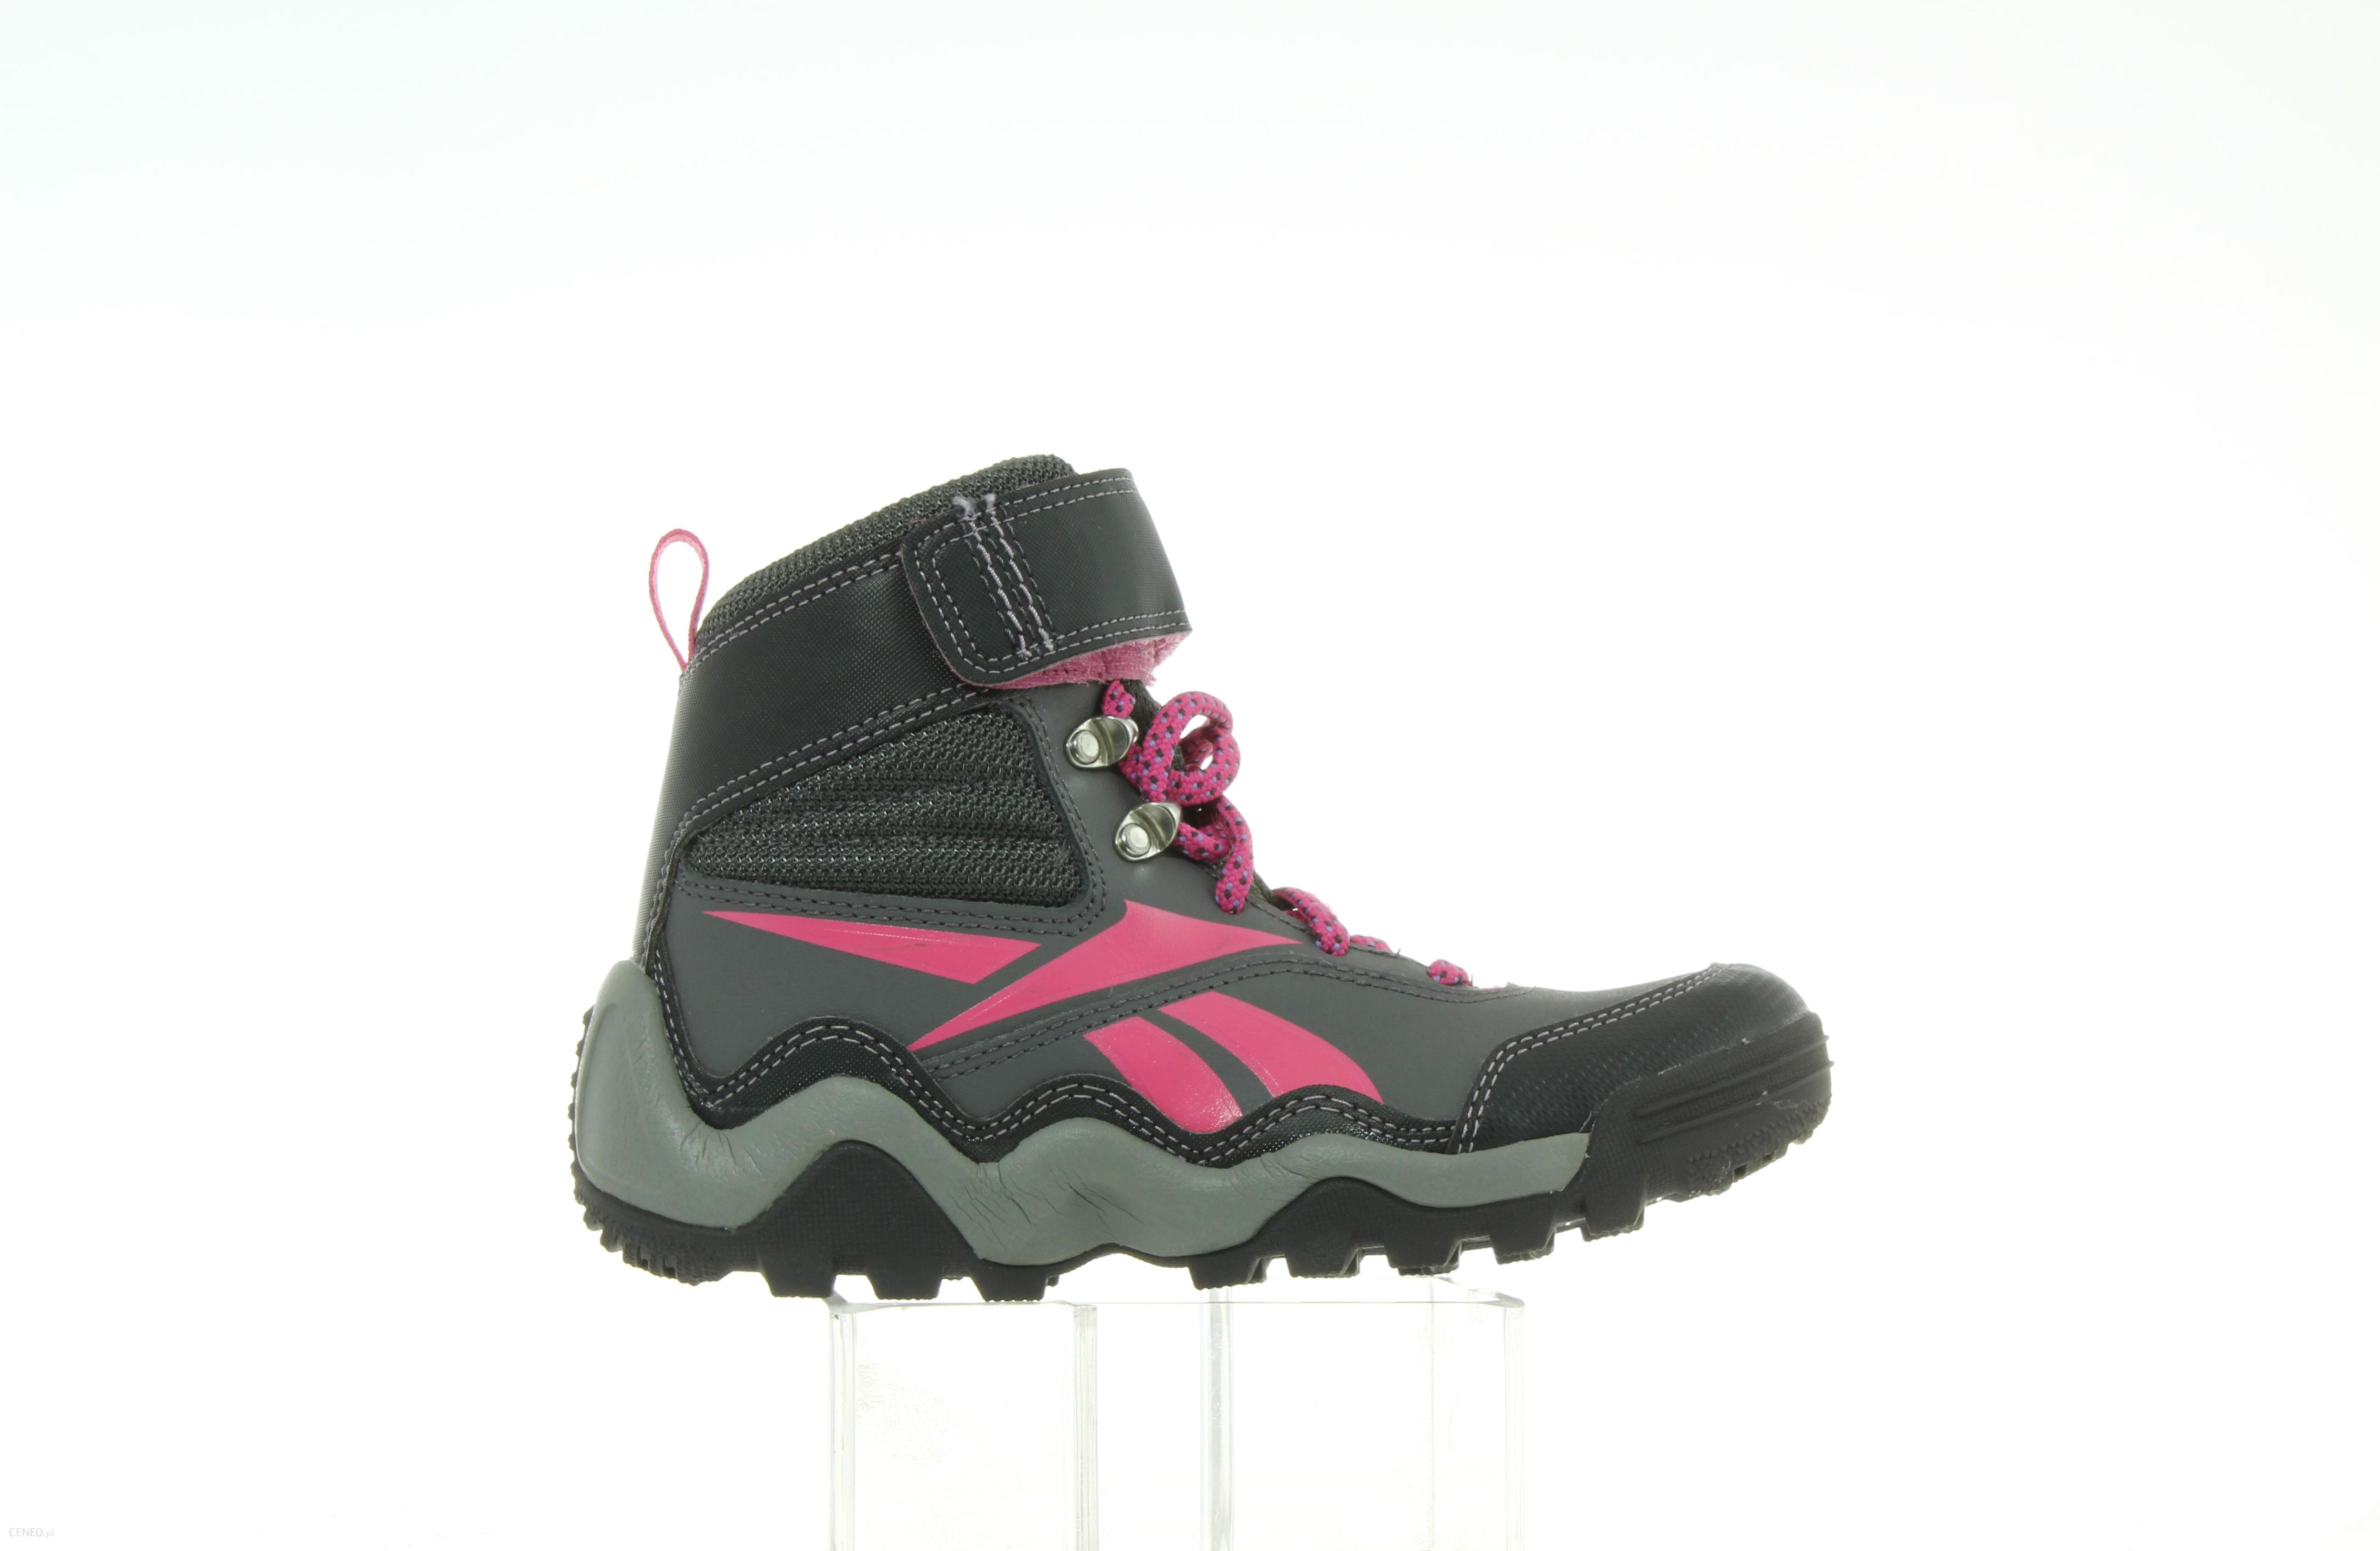 Buty Reebok Indstructr Hike (V46429) Szare, Różowe • sklep